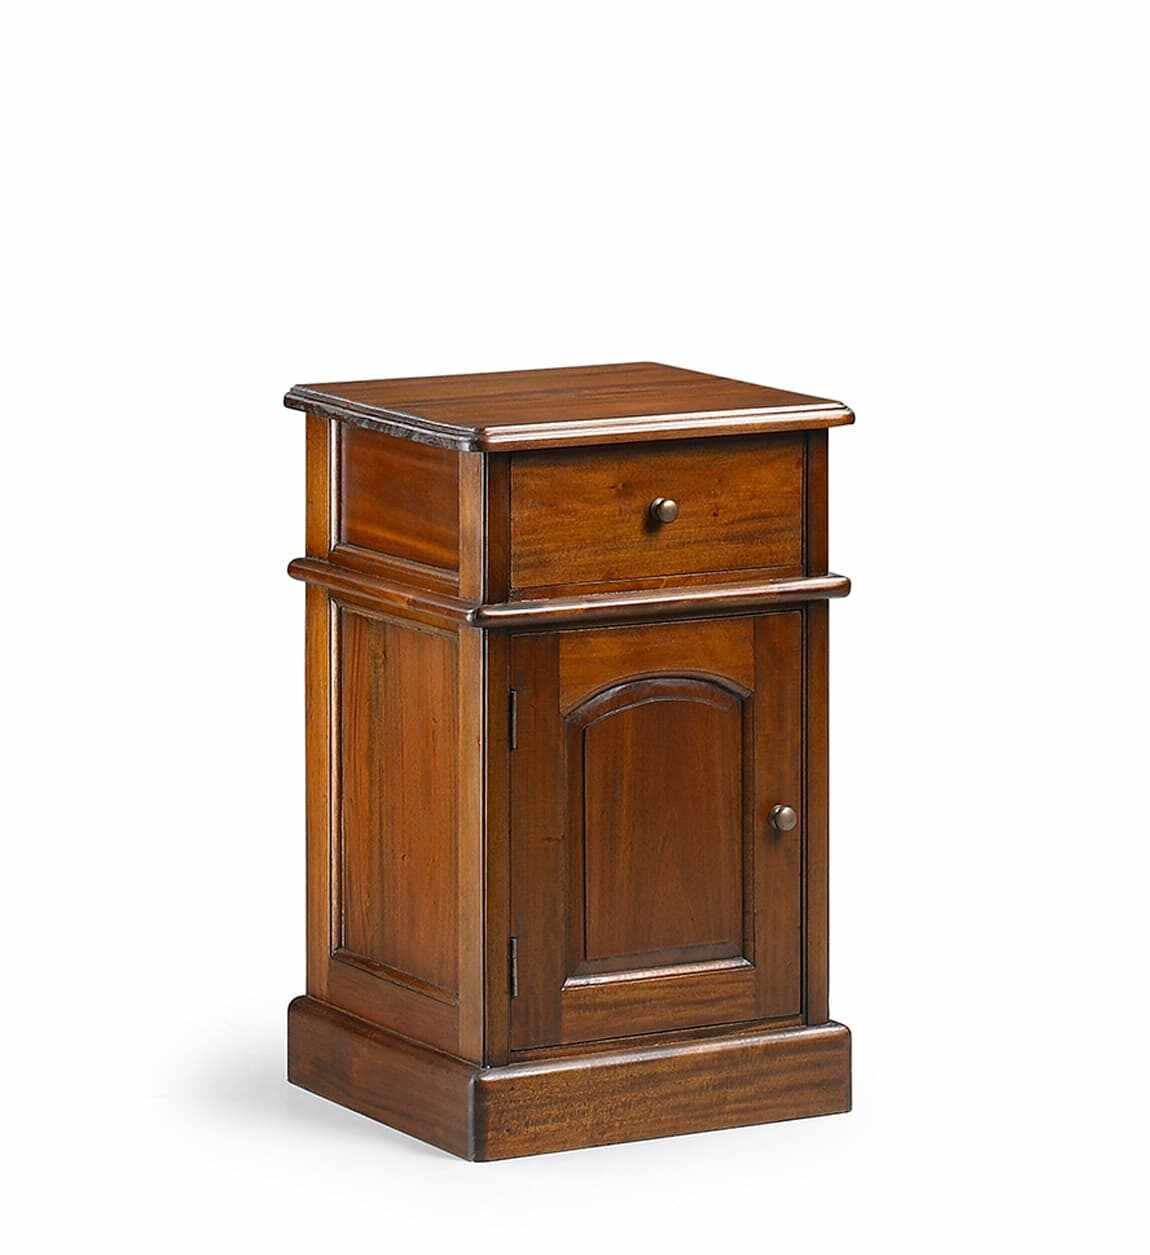 Noptiera din lemn cu 1 sertar si 1 usa, Vintage Nuc, l40xA40xH65 cm la pret 788 lei